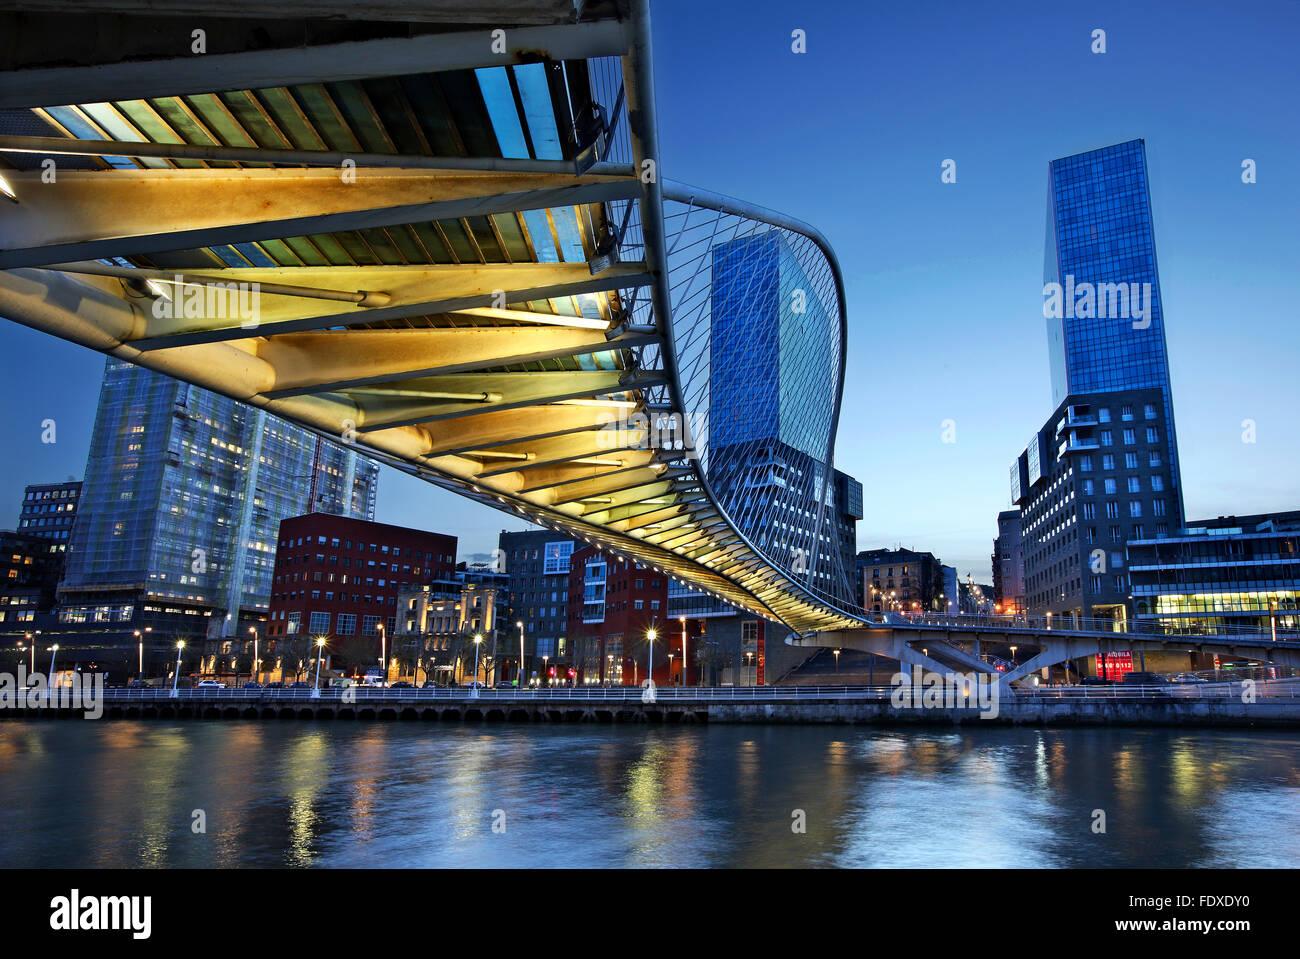 The Zubizuri (Basque for 'white bridge'),  across the Nervion River in Bilbao, Spain. - Stock Image